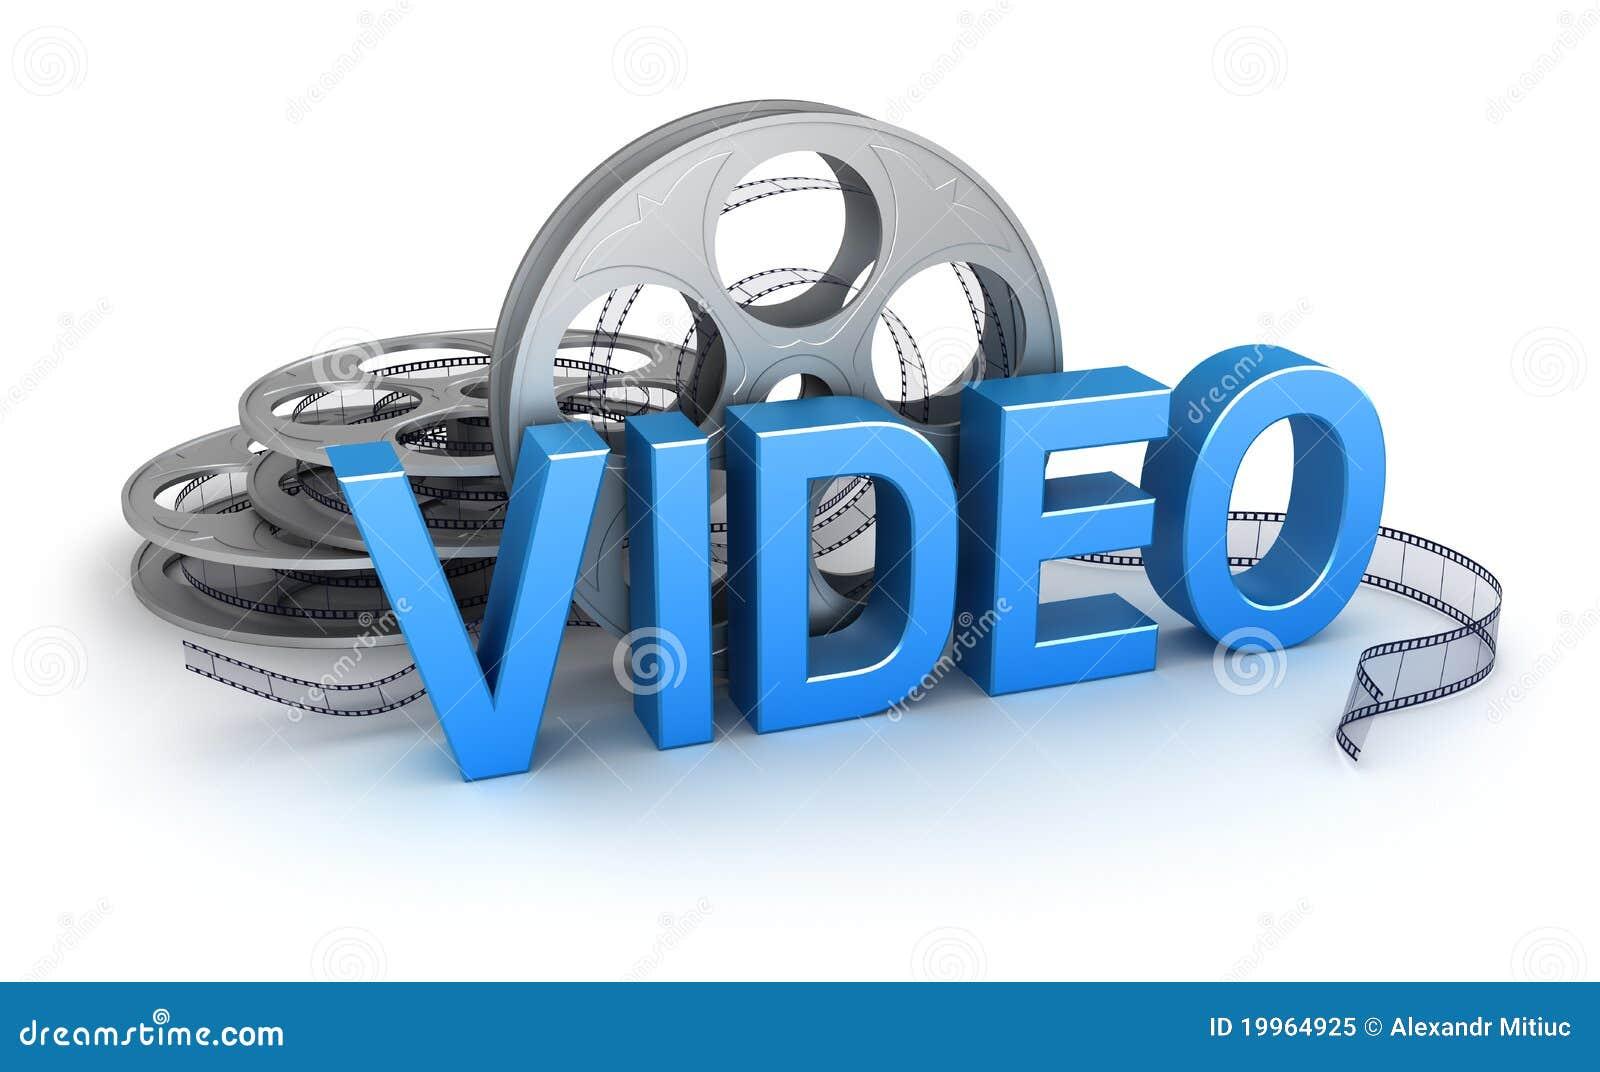 e-VIDEO